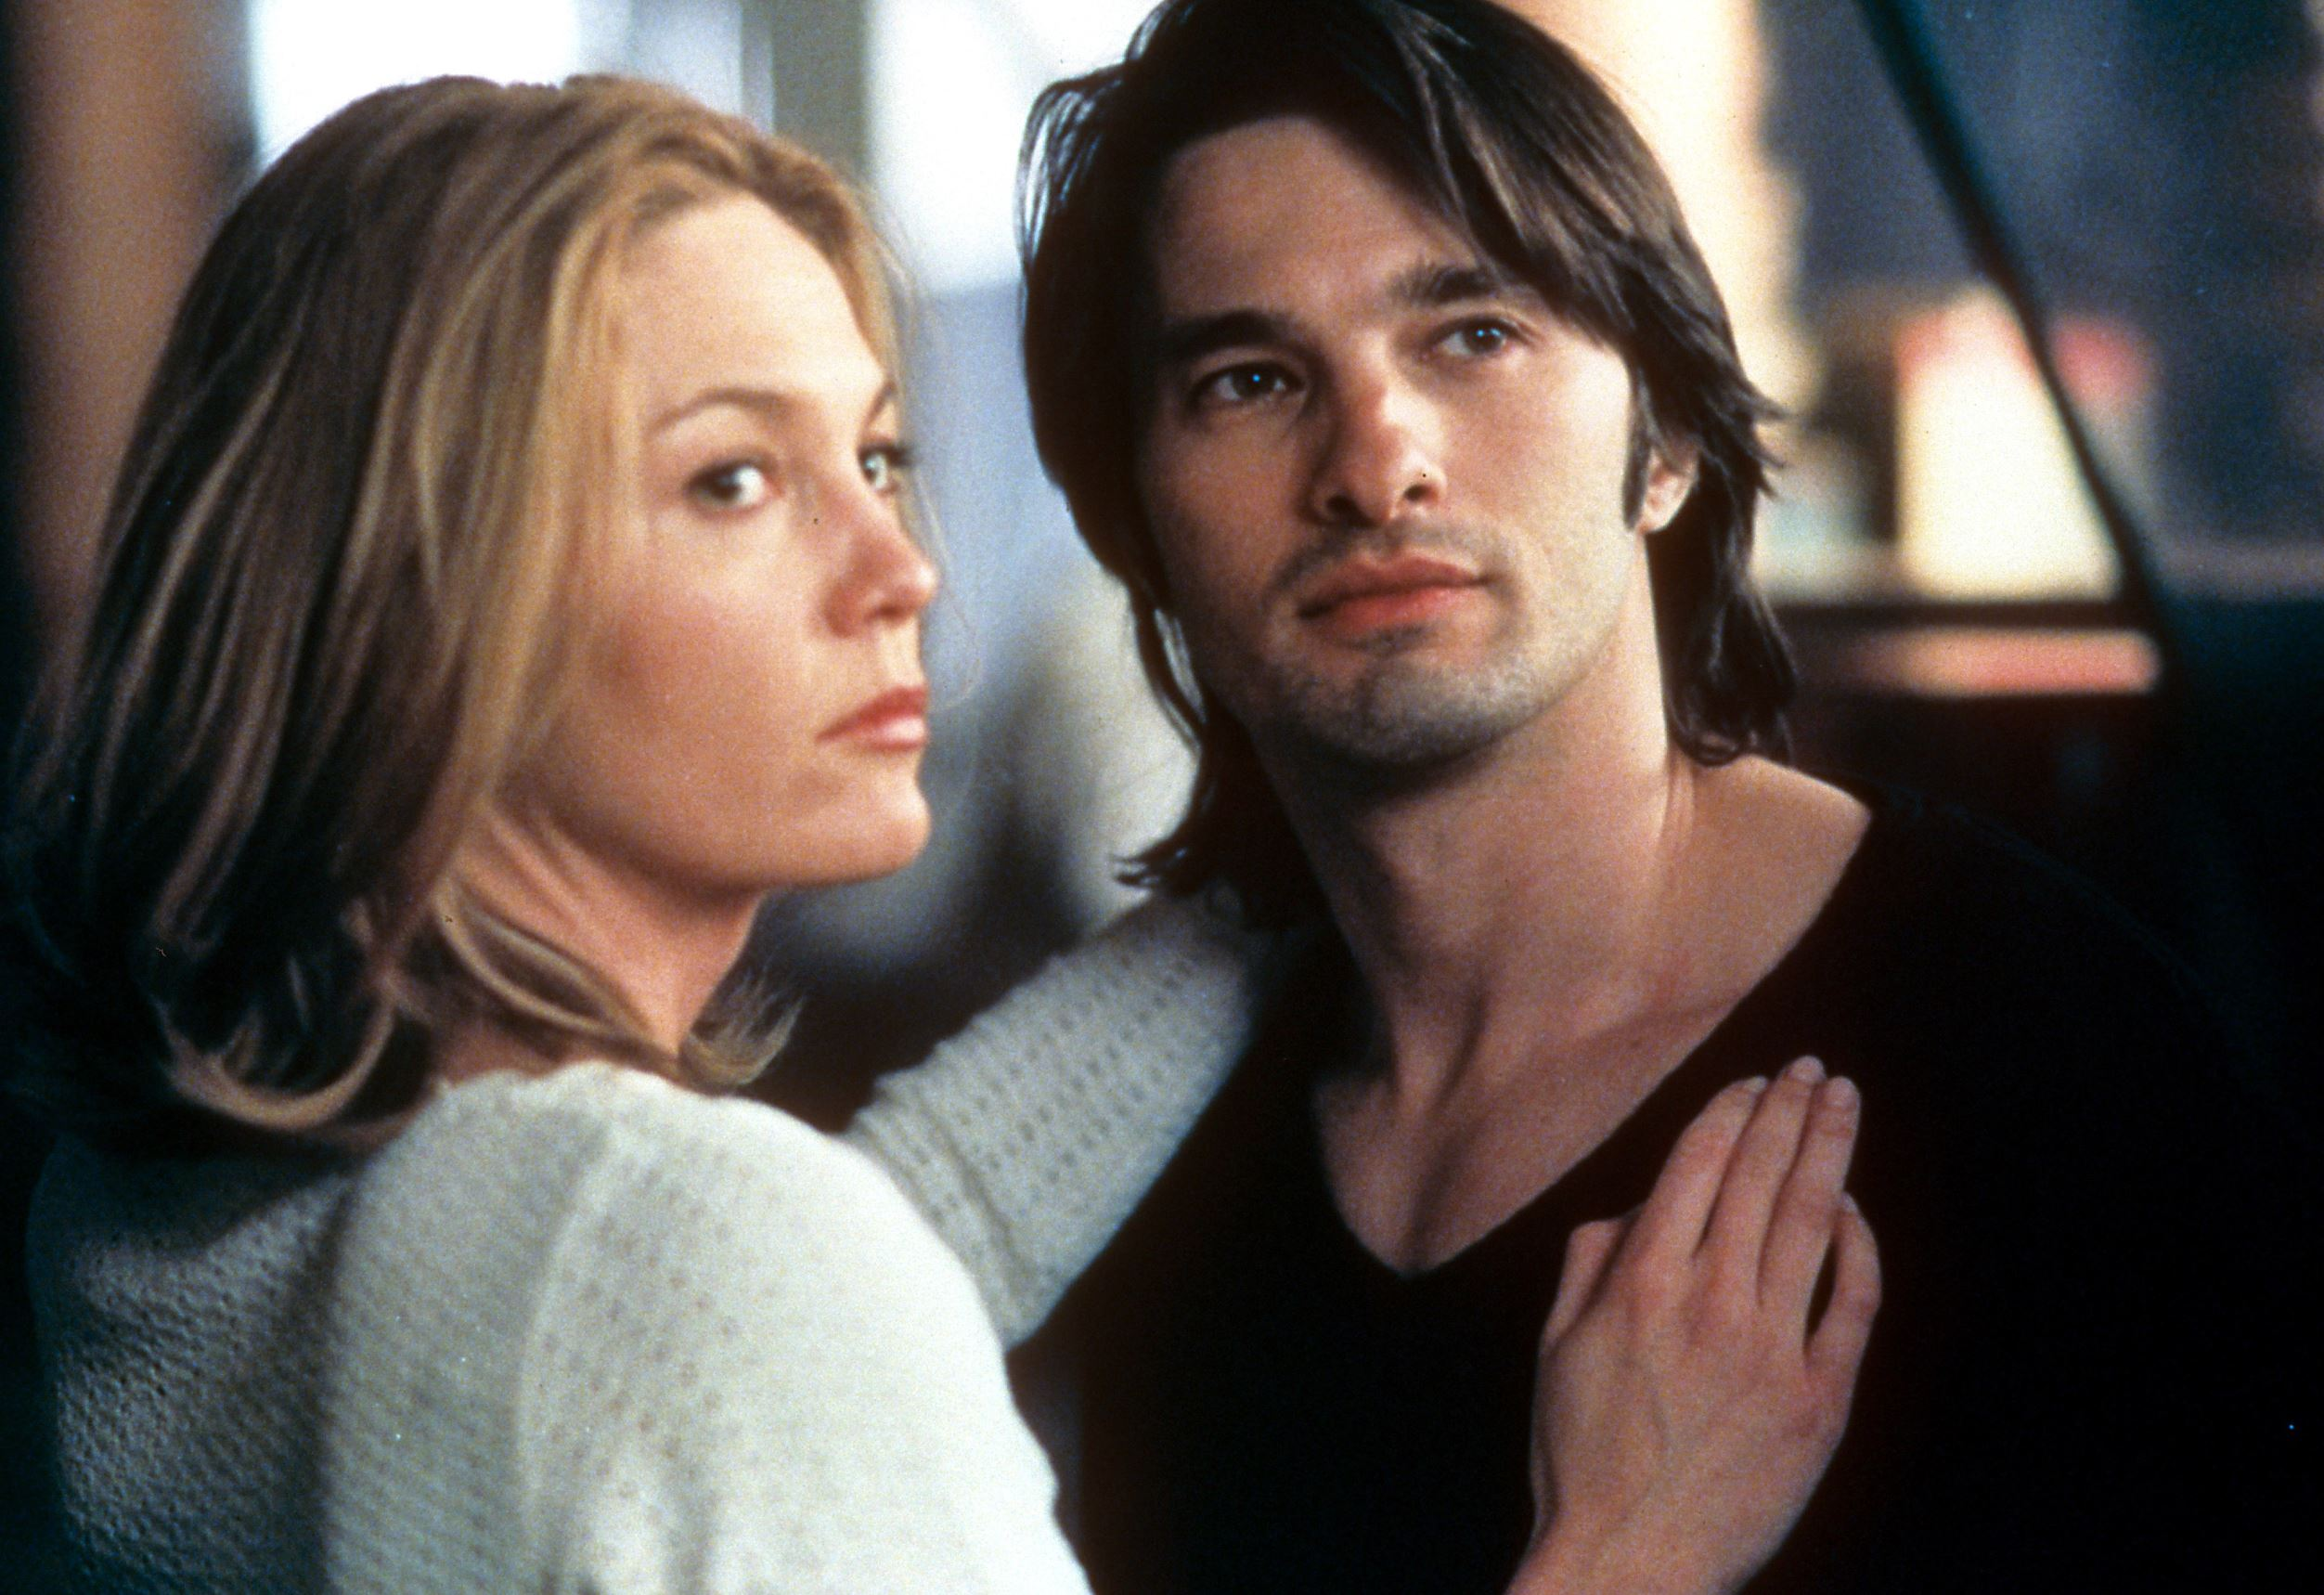 Slide 1 of 16: Diane Lane And Olivier Martinez In 'Unfaithful'